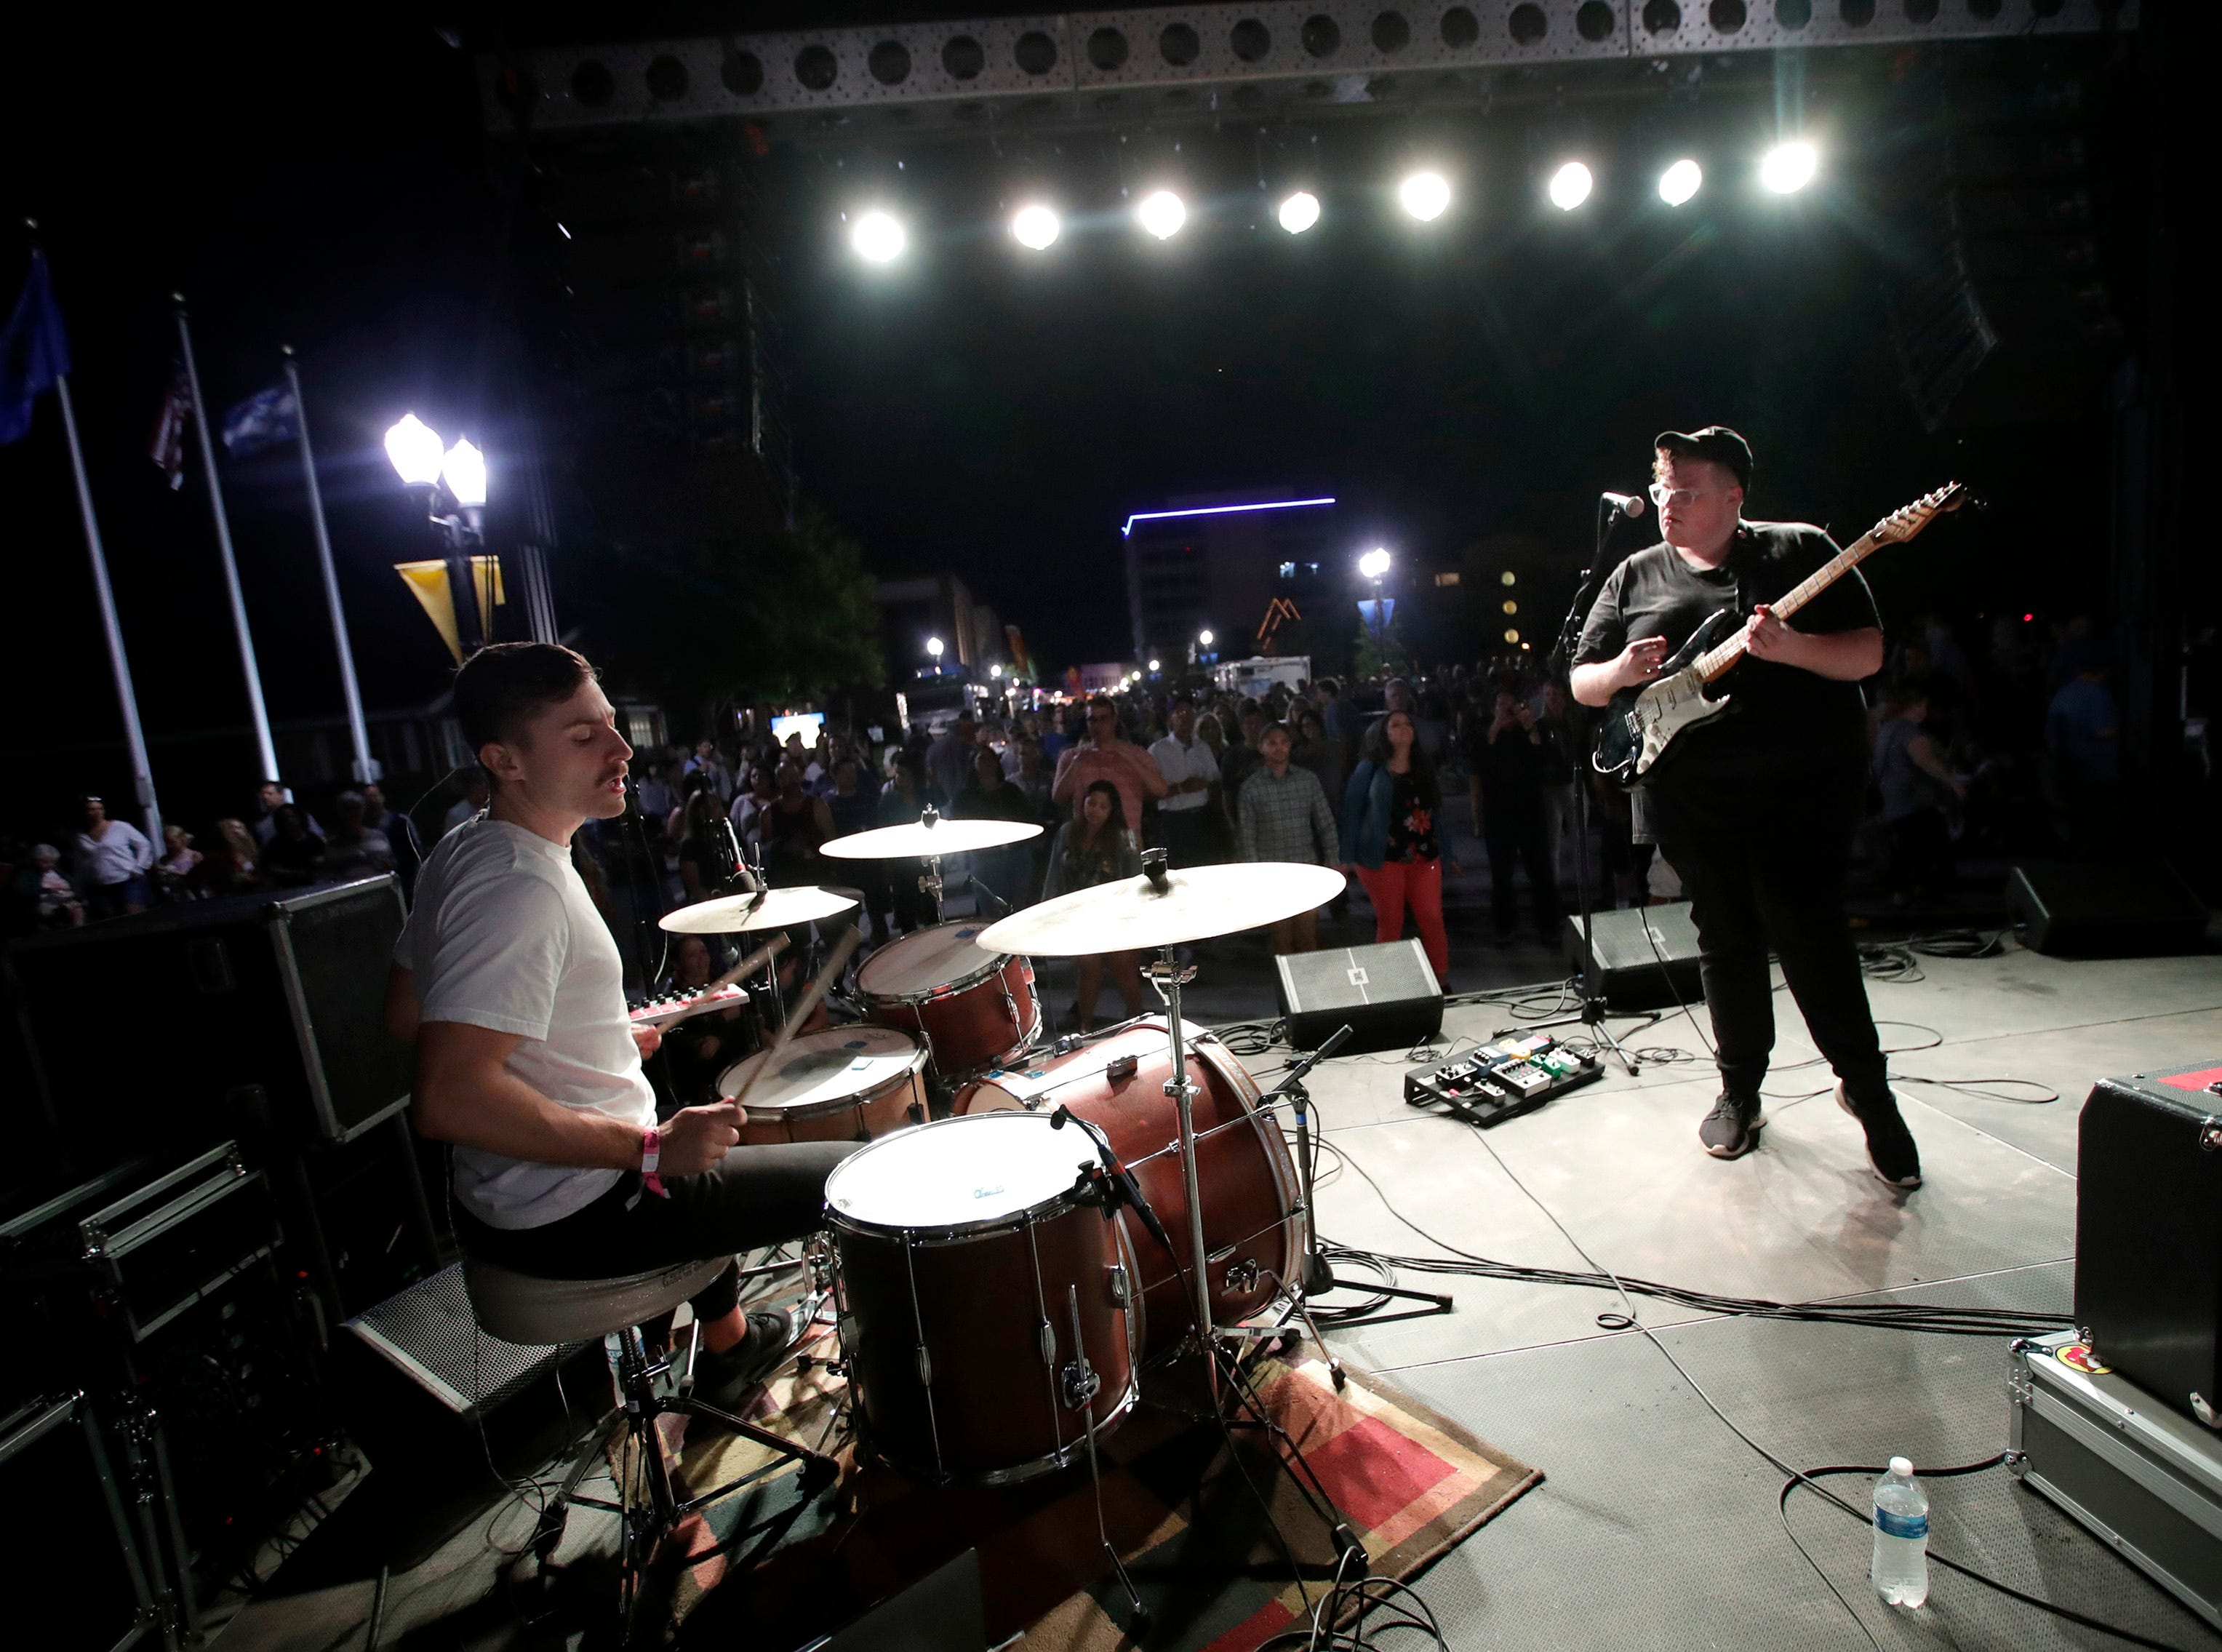 Michigander performs during Bazaar After Dark Wednesday, Sept. 12, 2018, in Menasha, Wis.Danny Damiani/USA TODAY NETWORK-Wisconsin